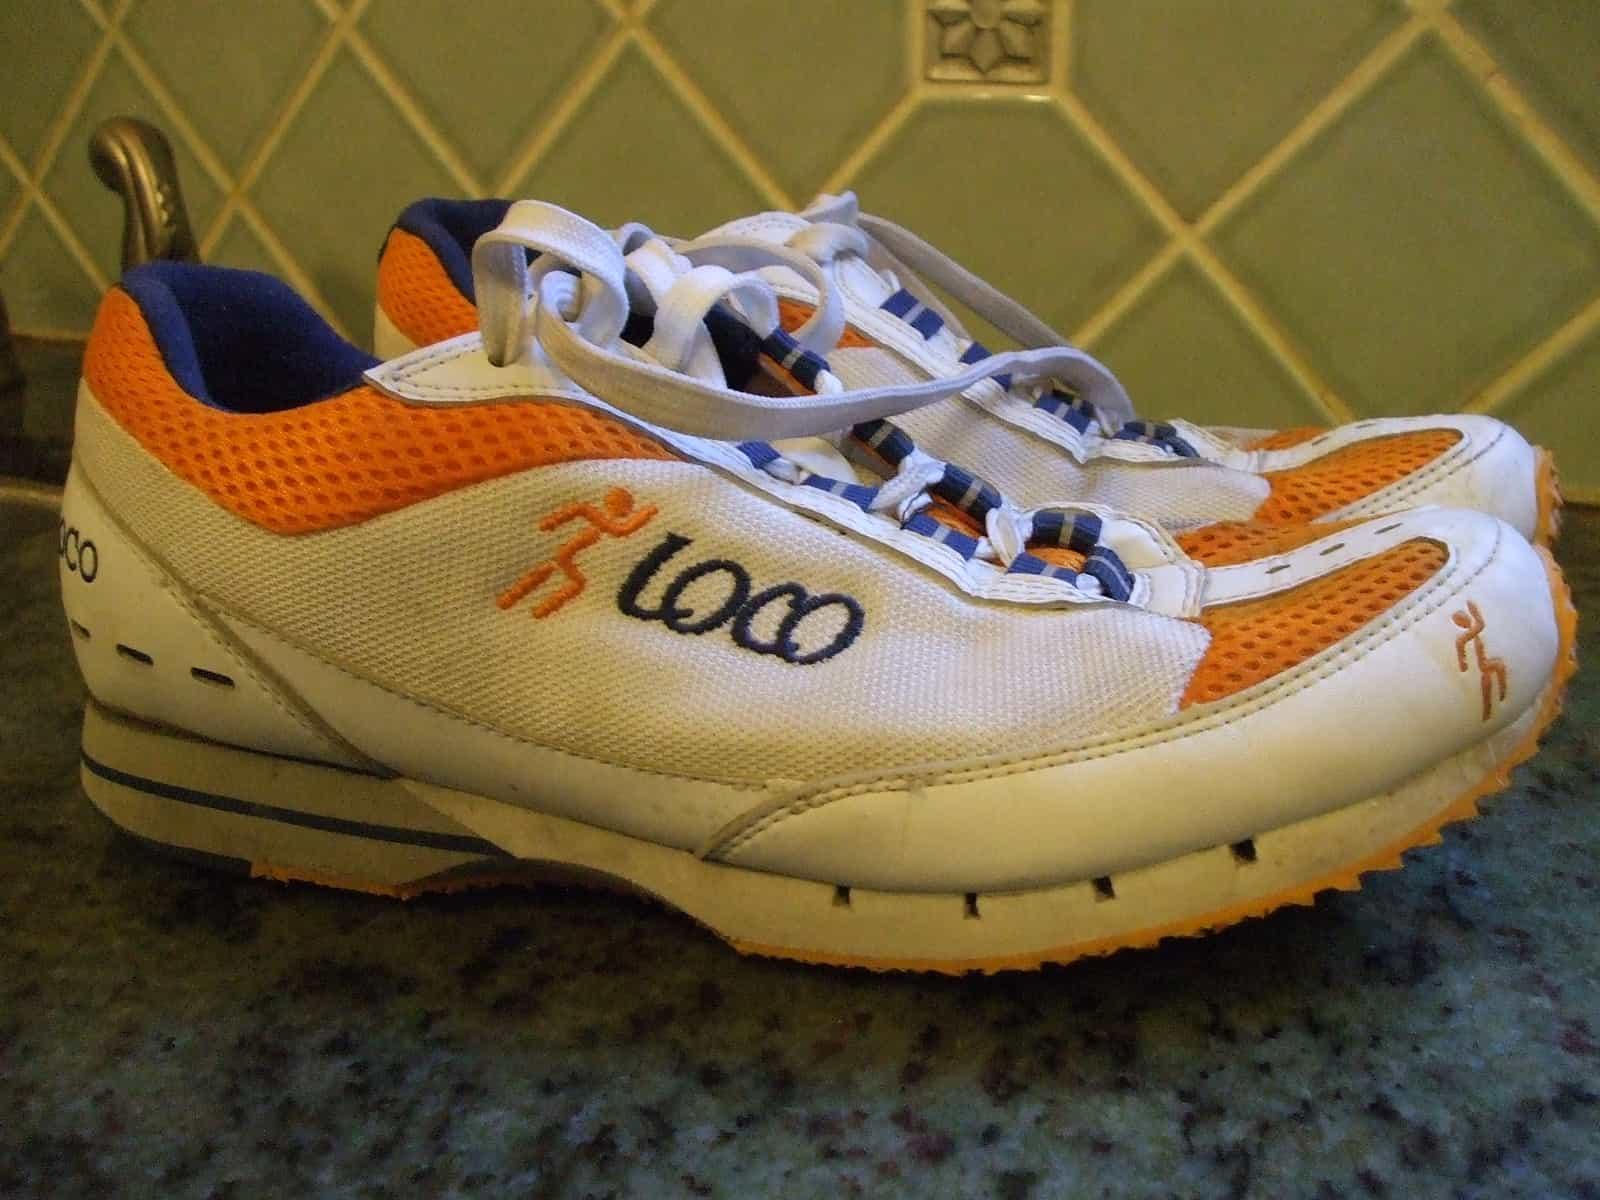 Loco Bandito Running Shoes